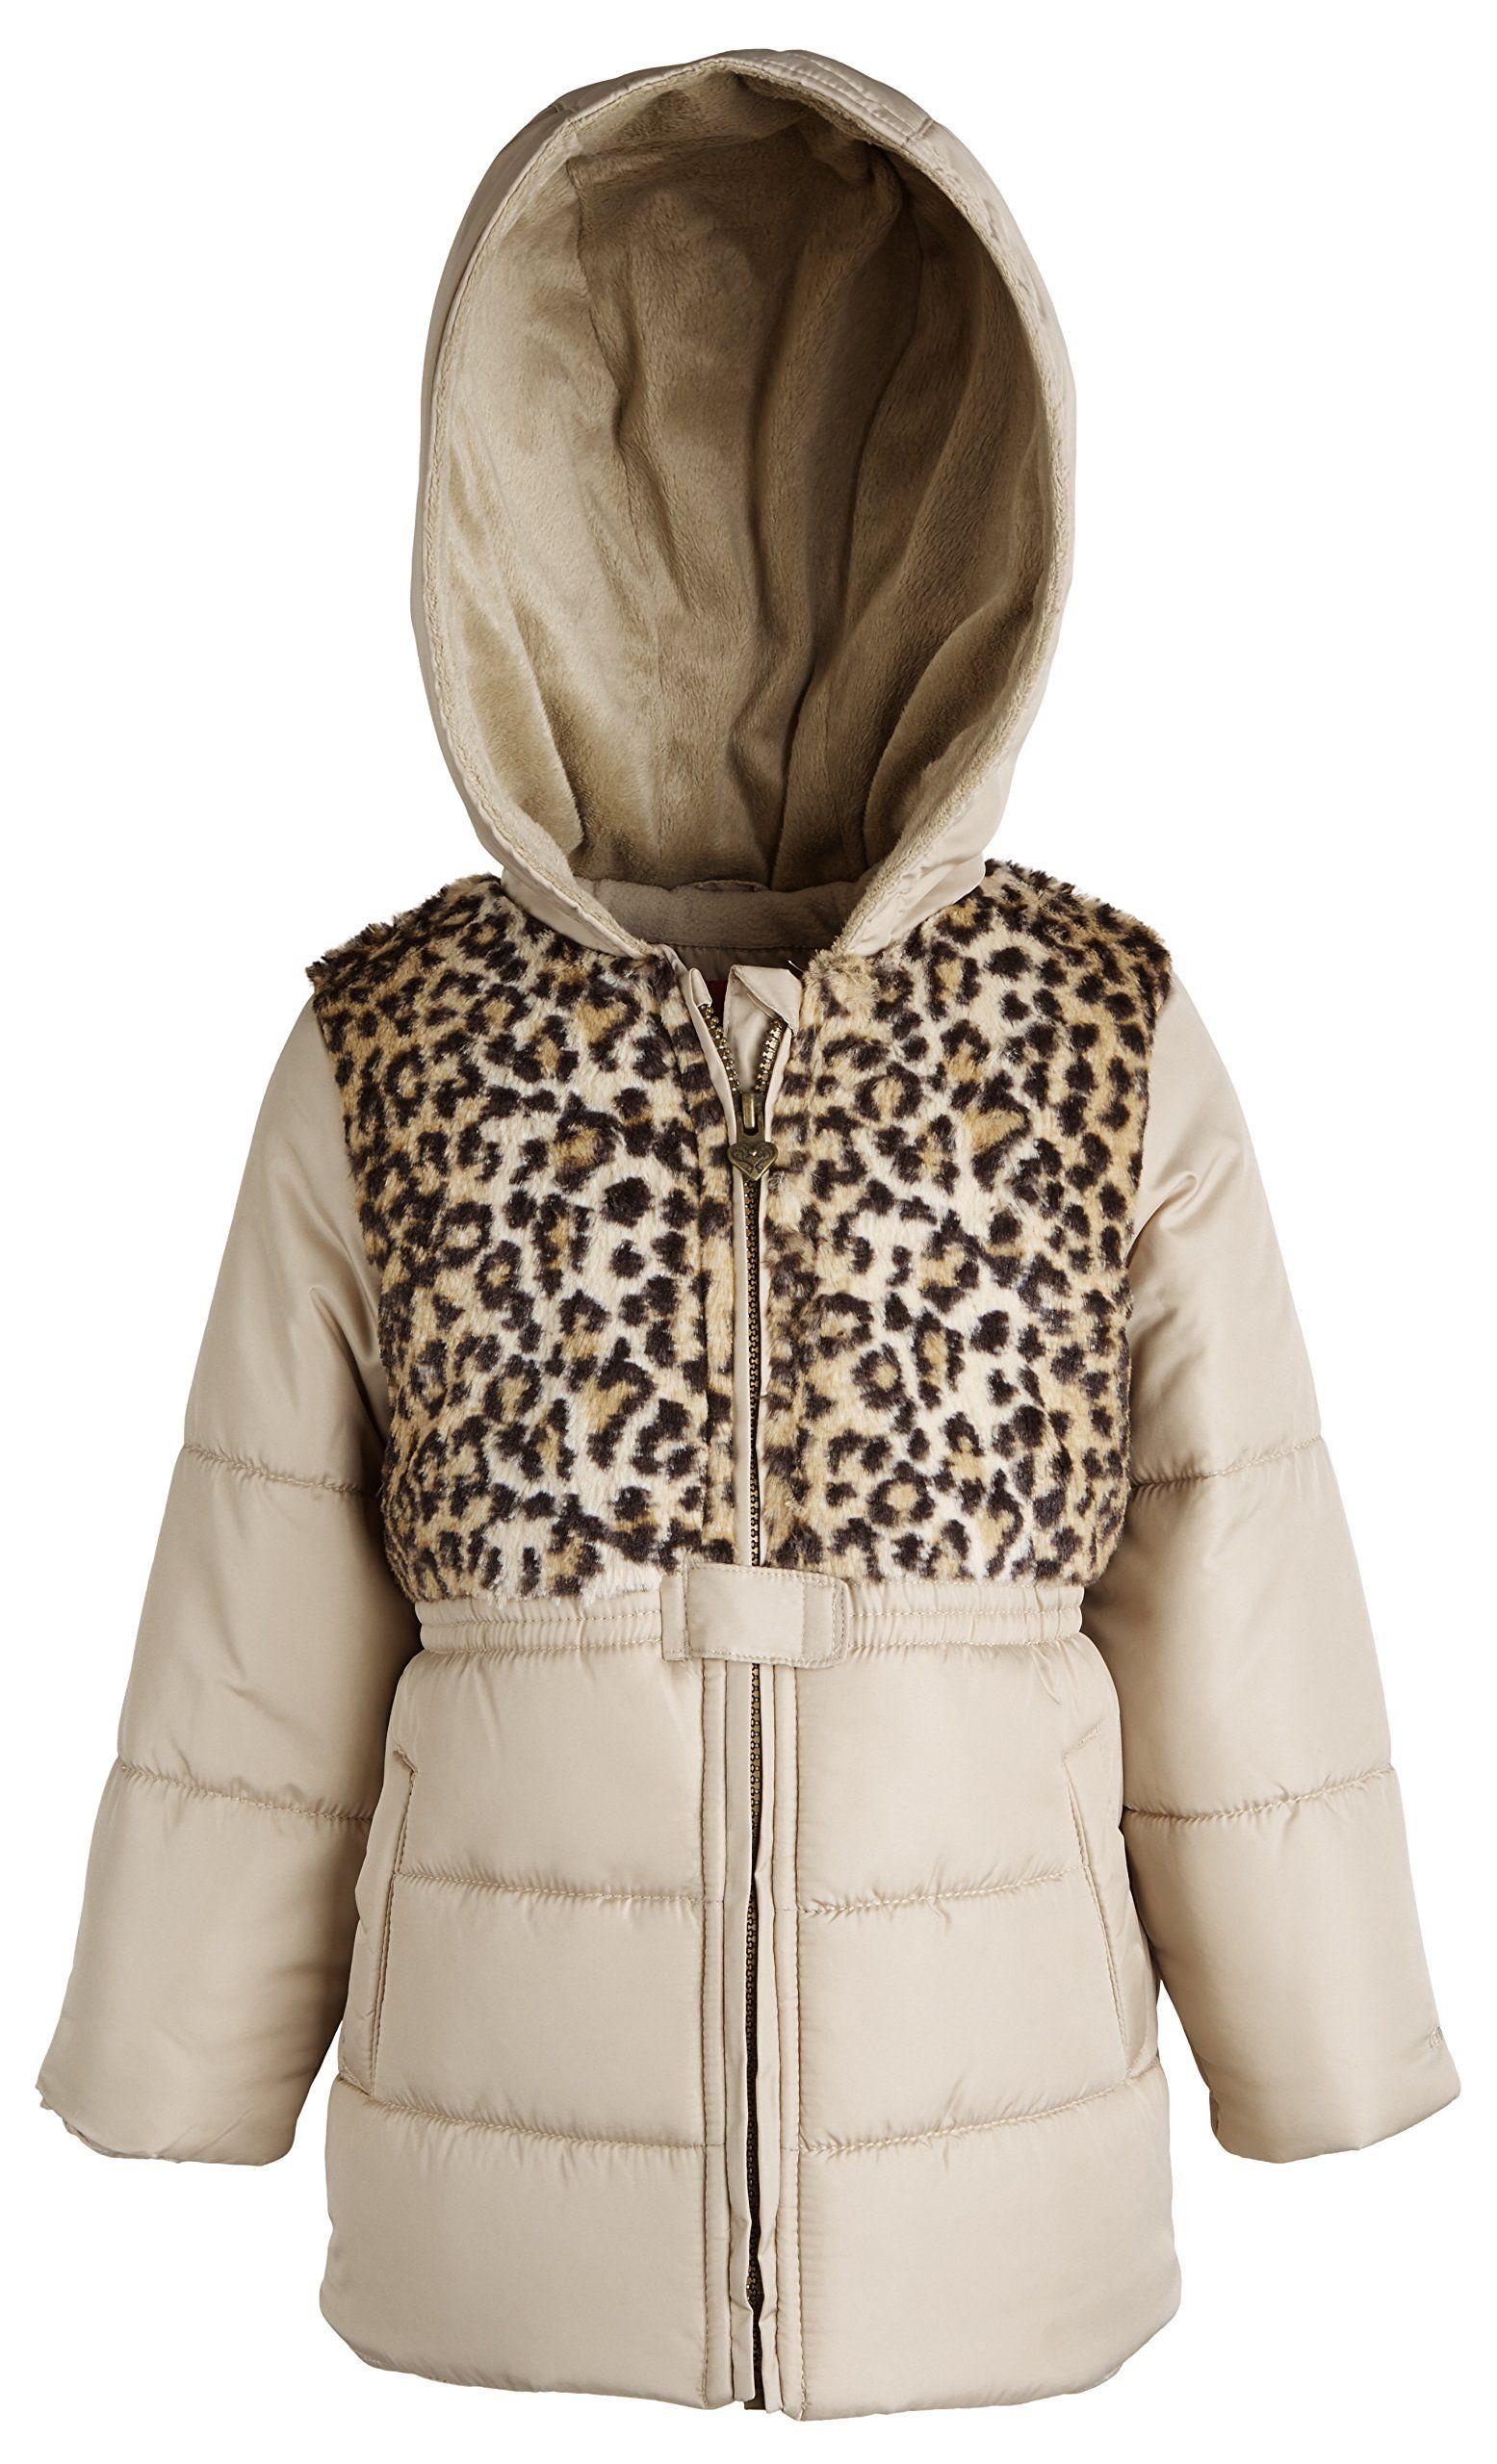 London Fog Baby Girls Leopard Chest Insulated Jacket Khaki 12 Months Back Is Fleece Lined Inside Secure Han Winter Puffer Jackets Jackets Girls Leopard [ 2560 x 1555 Pixel ]